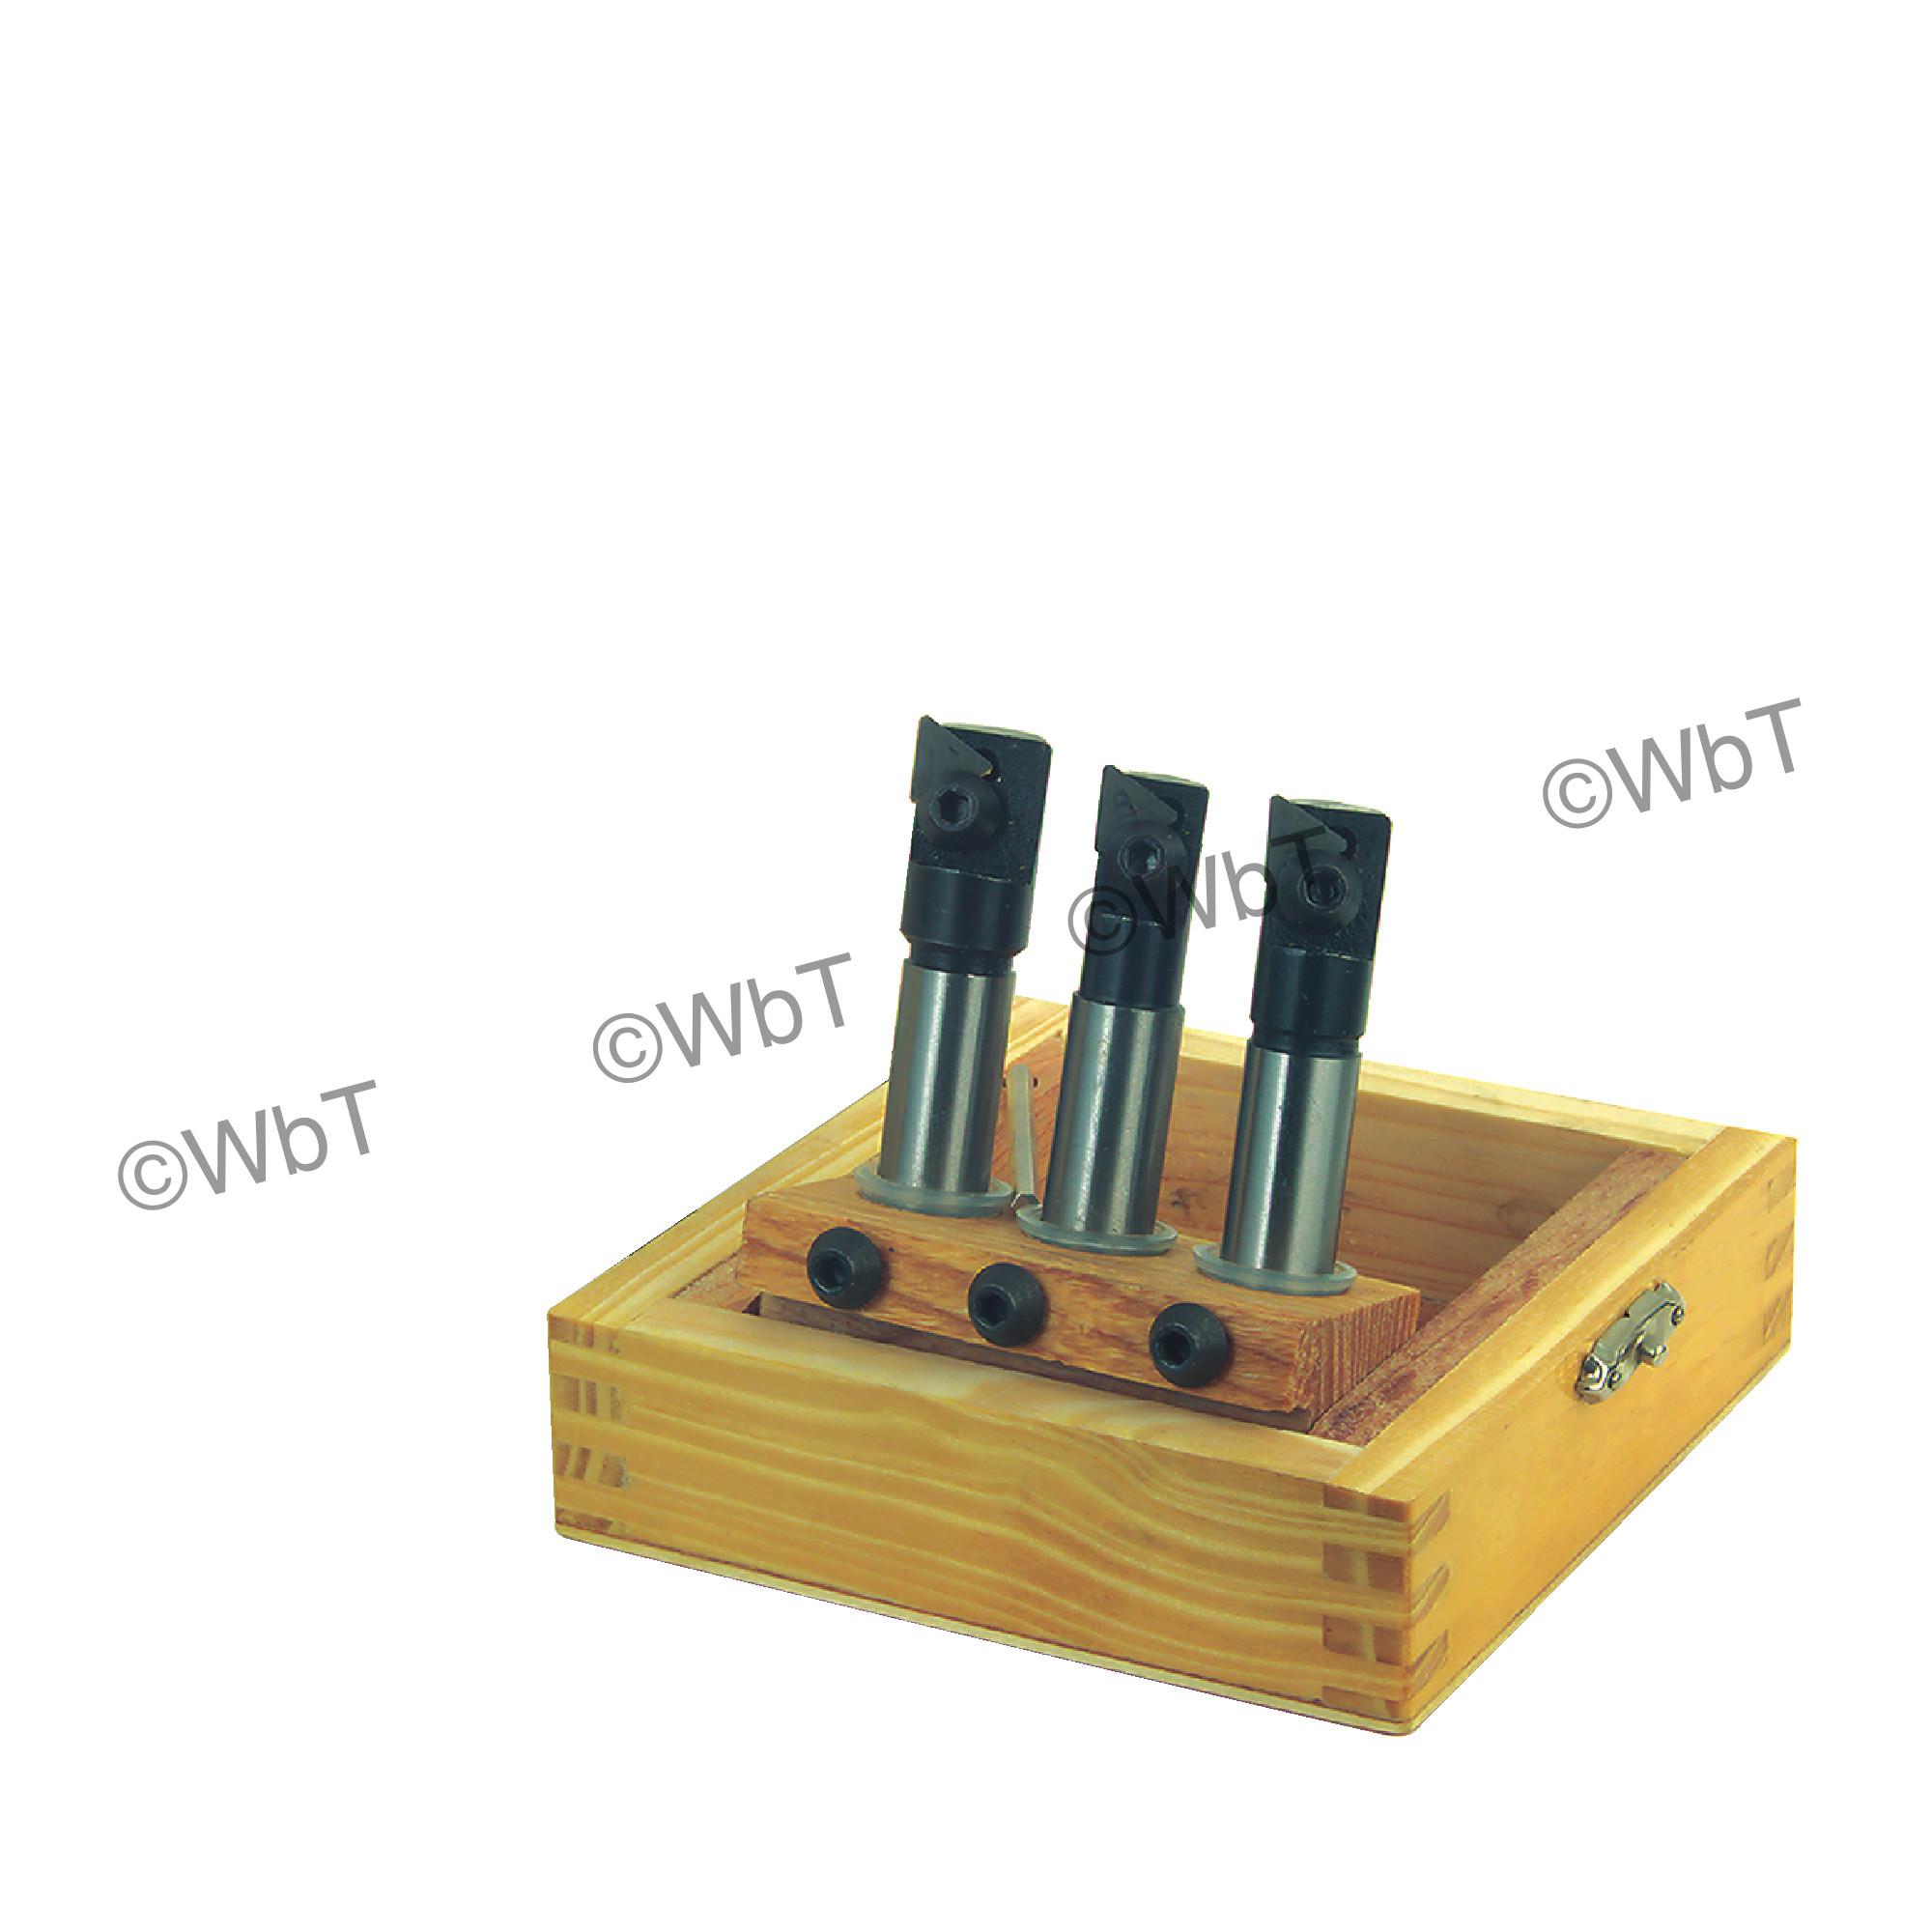 "TTC PRODUCTION - TriDex Milling Set with Inserts (1/2""ø, 9/16""ø, & 5/8""ø) & (10) TPU221 C5 Uncoated"